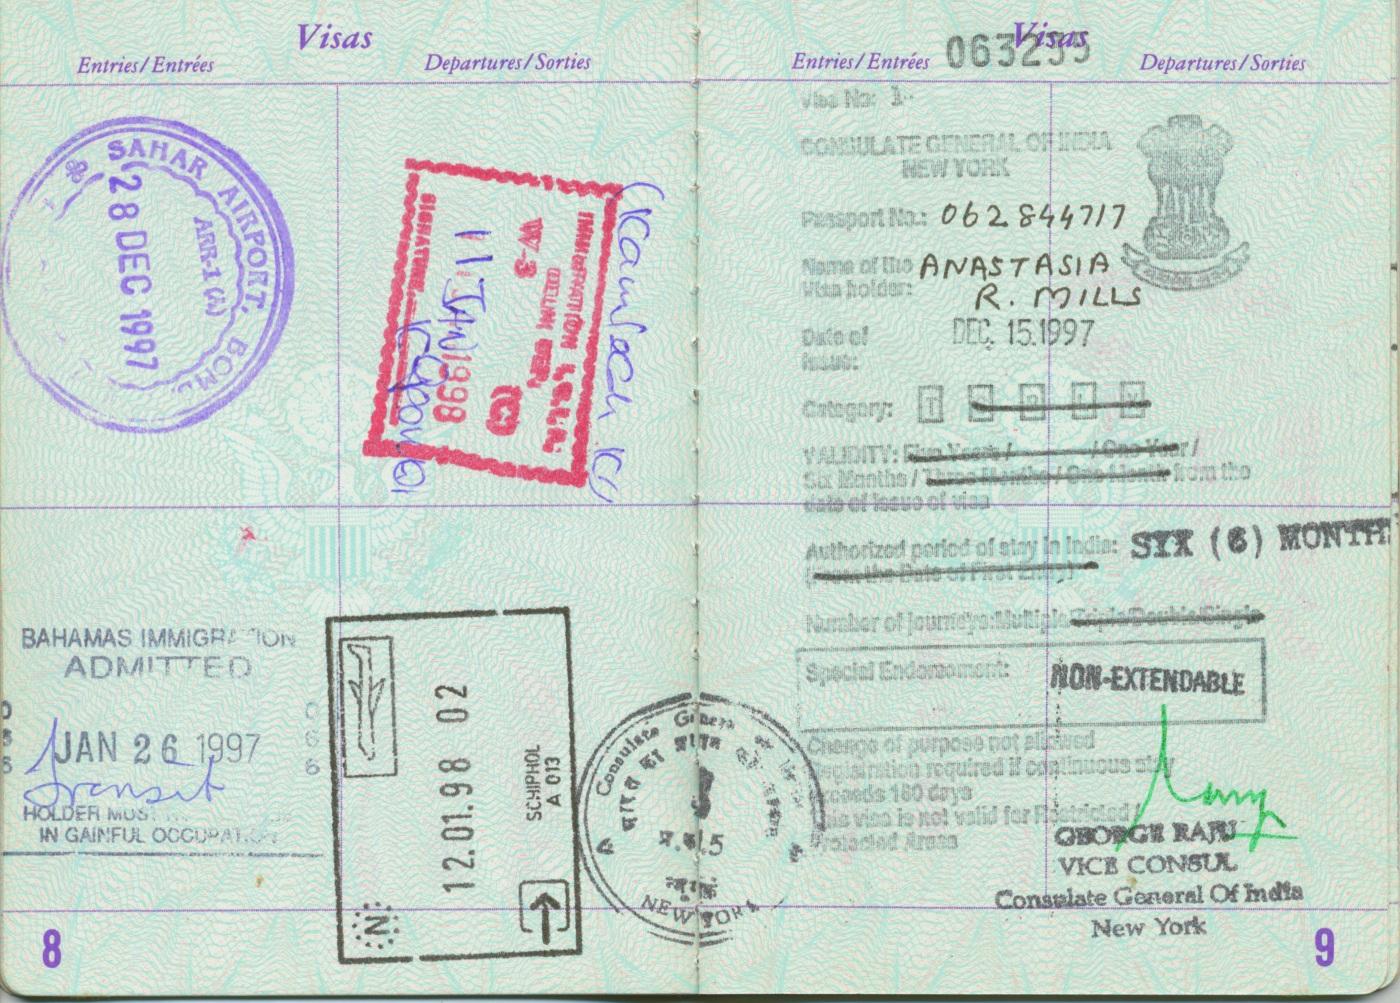 A peek inside one of Stasha's old pasports